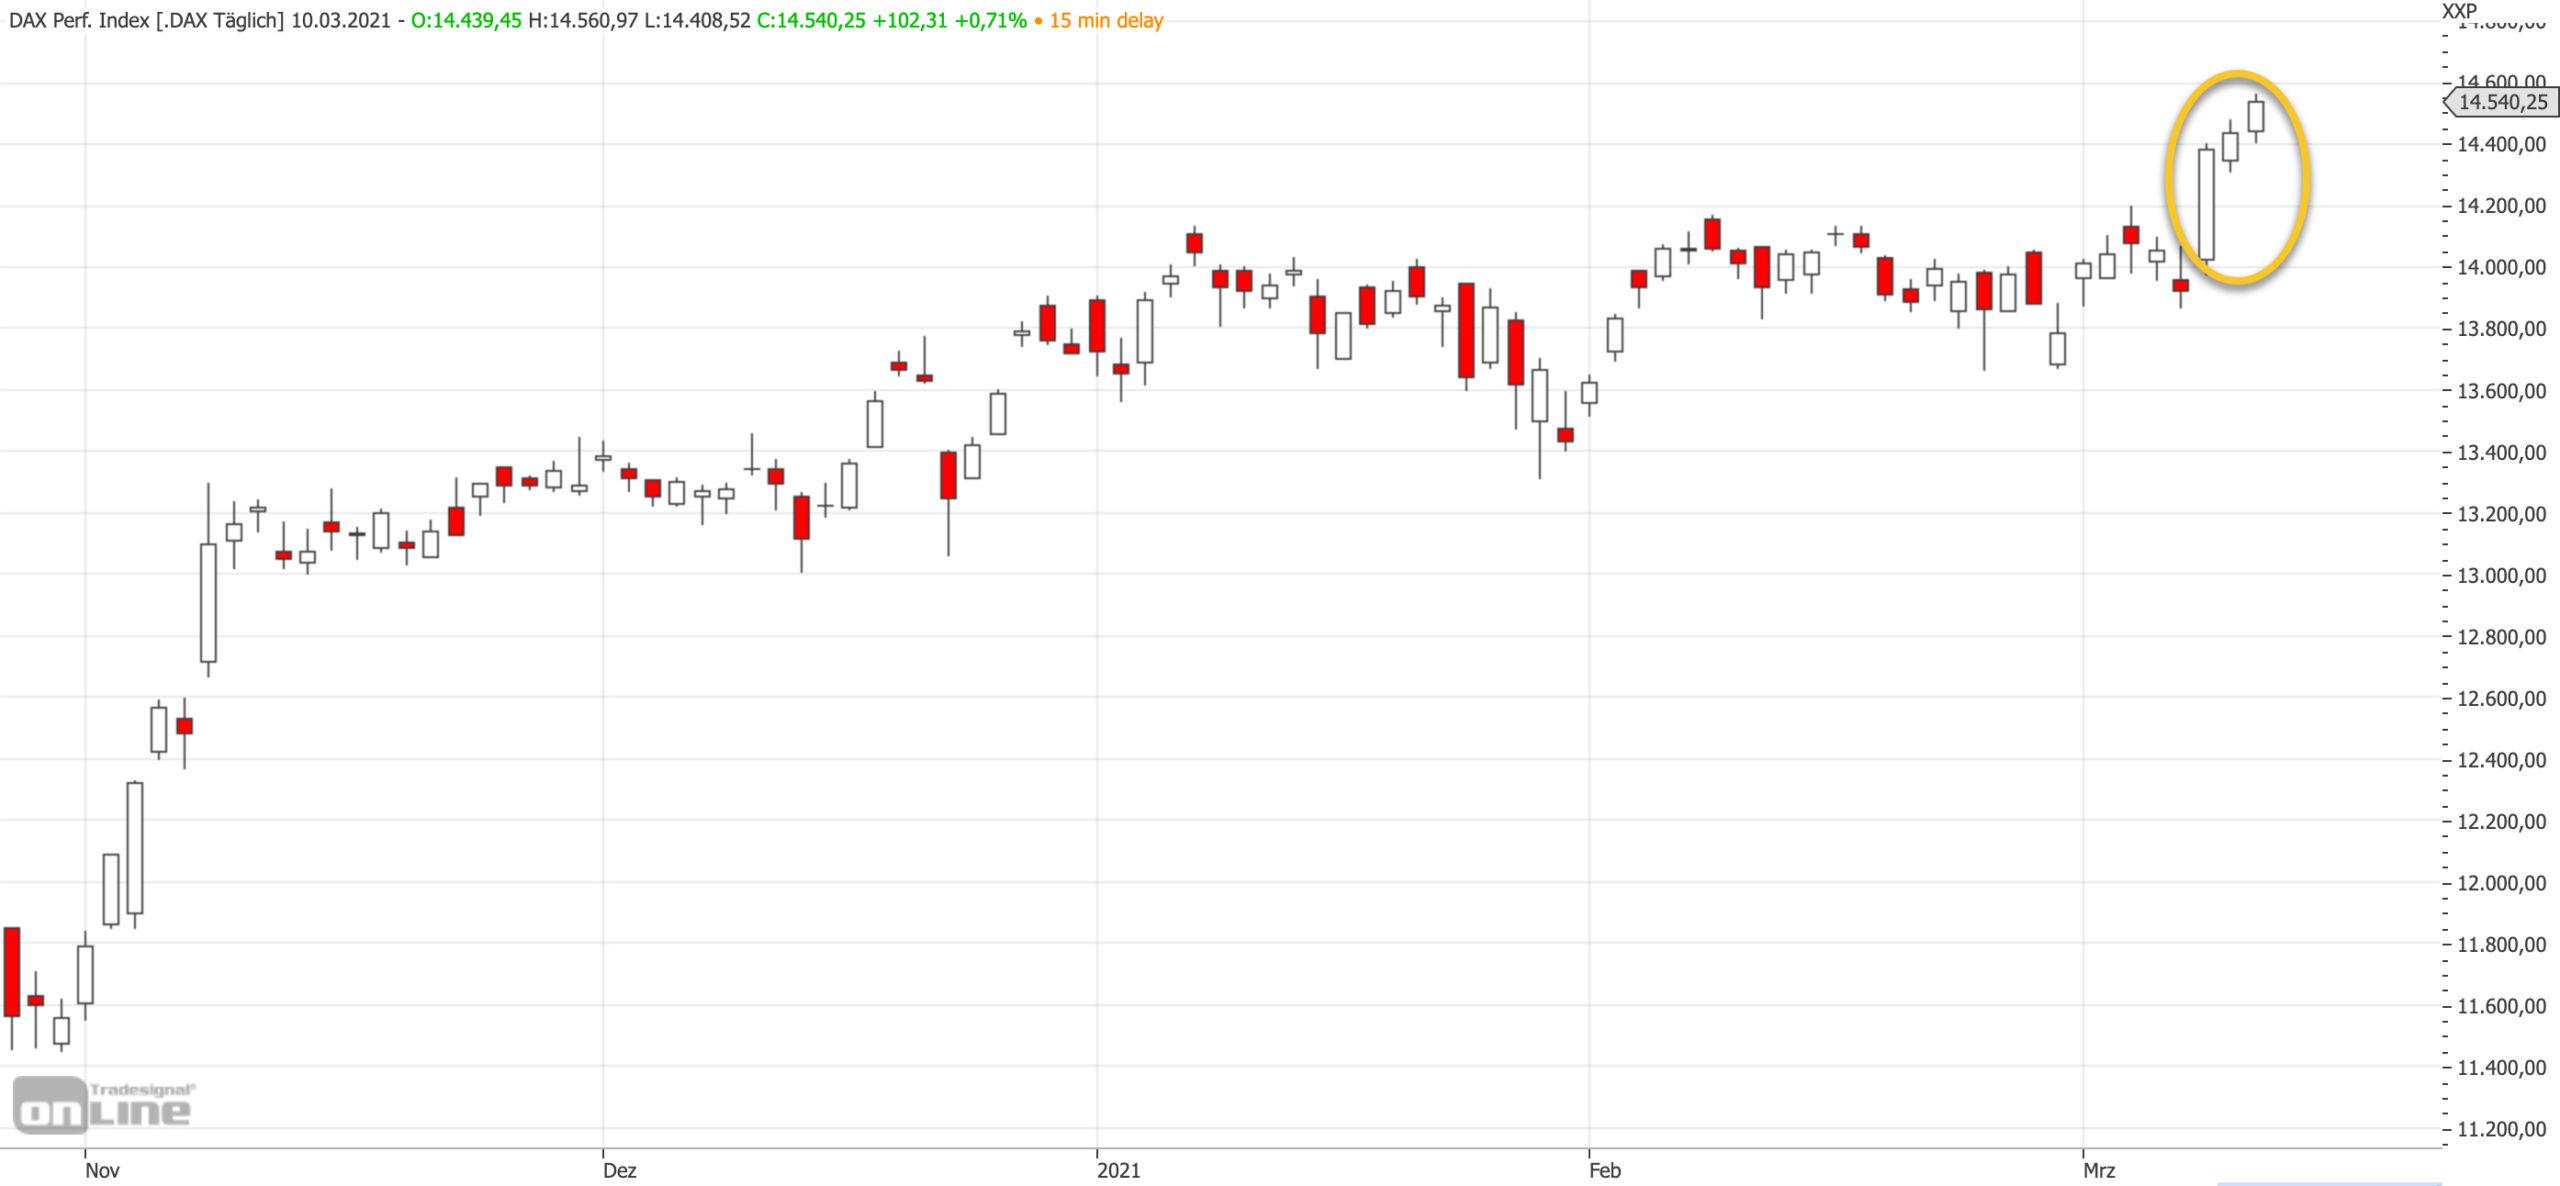 Mittelfristiger DAX-Chart am 10.03.2021